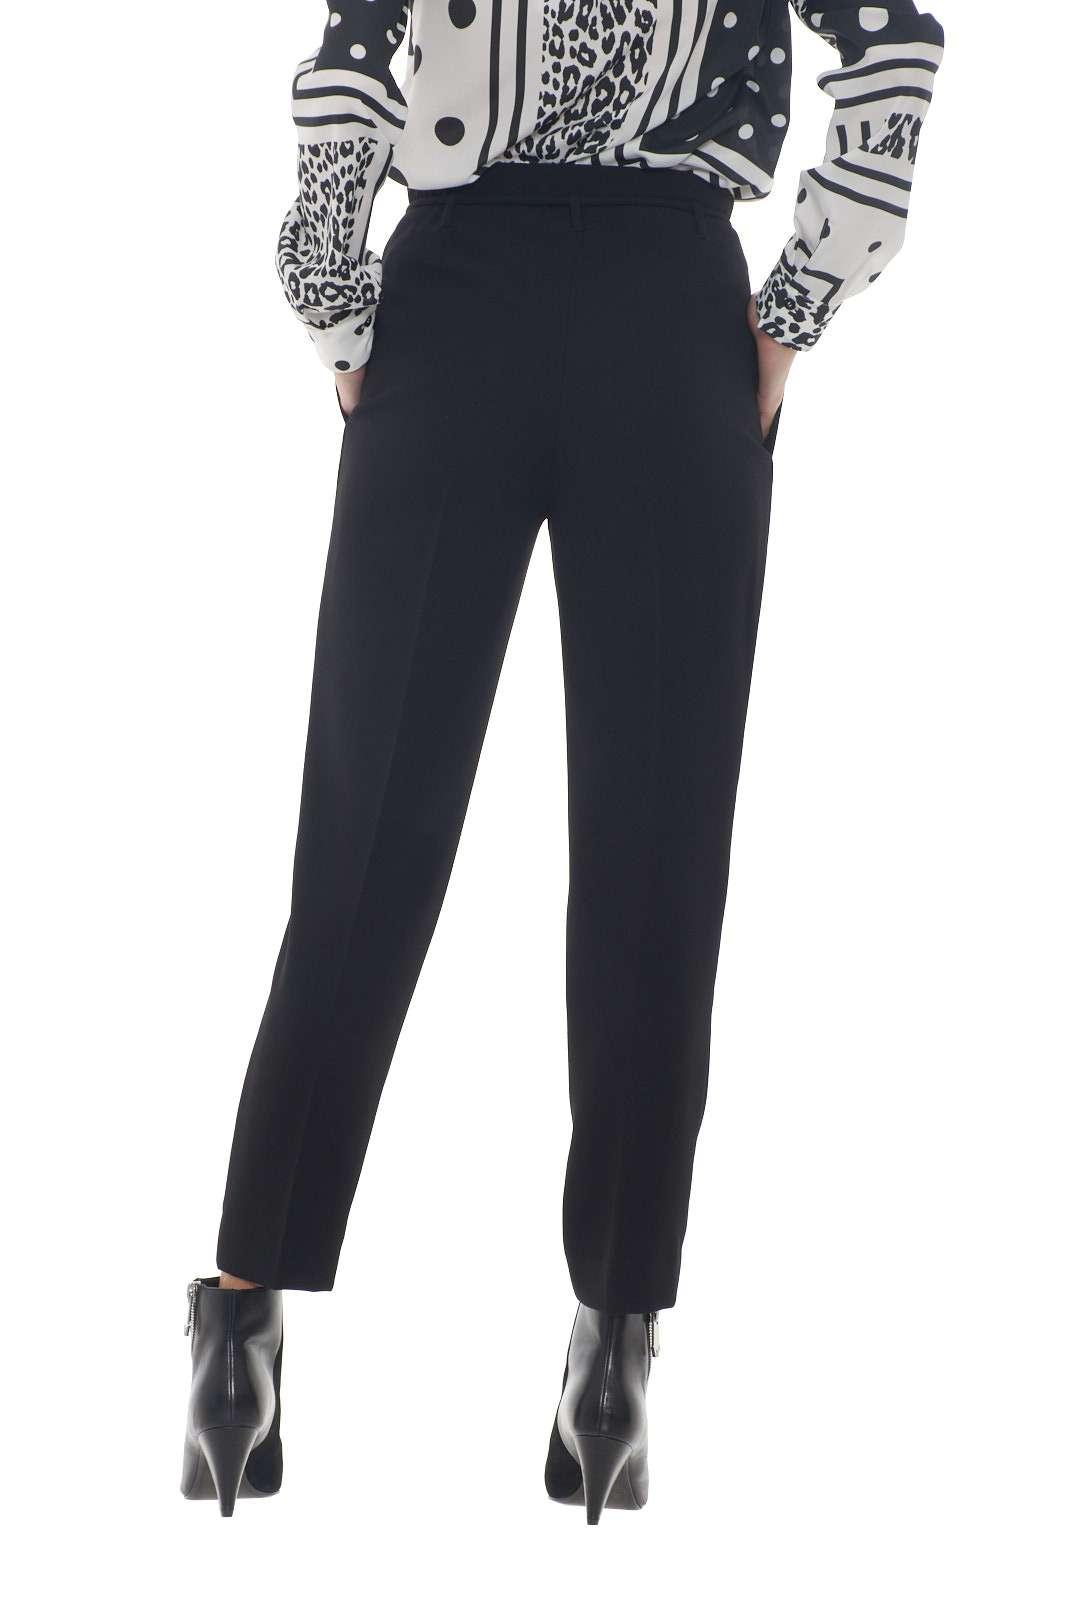 https://www.parmax.com/media/catalog/product/a/i/AI-outlet_parmax-pantaloni-donna-Liu-Jo-C19146-C.jpg